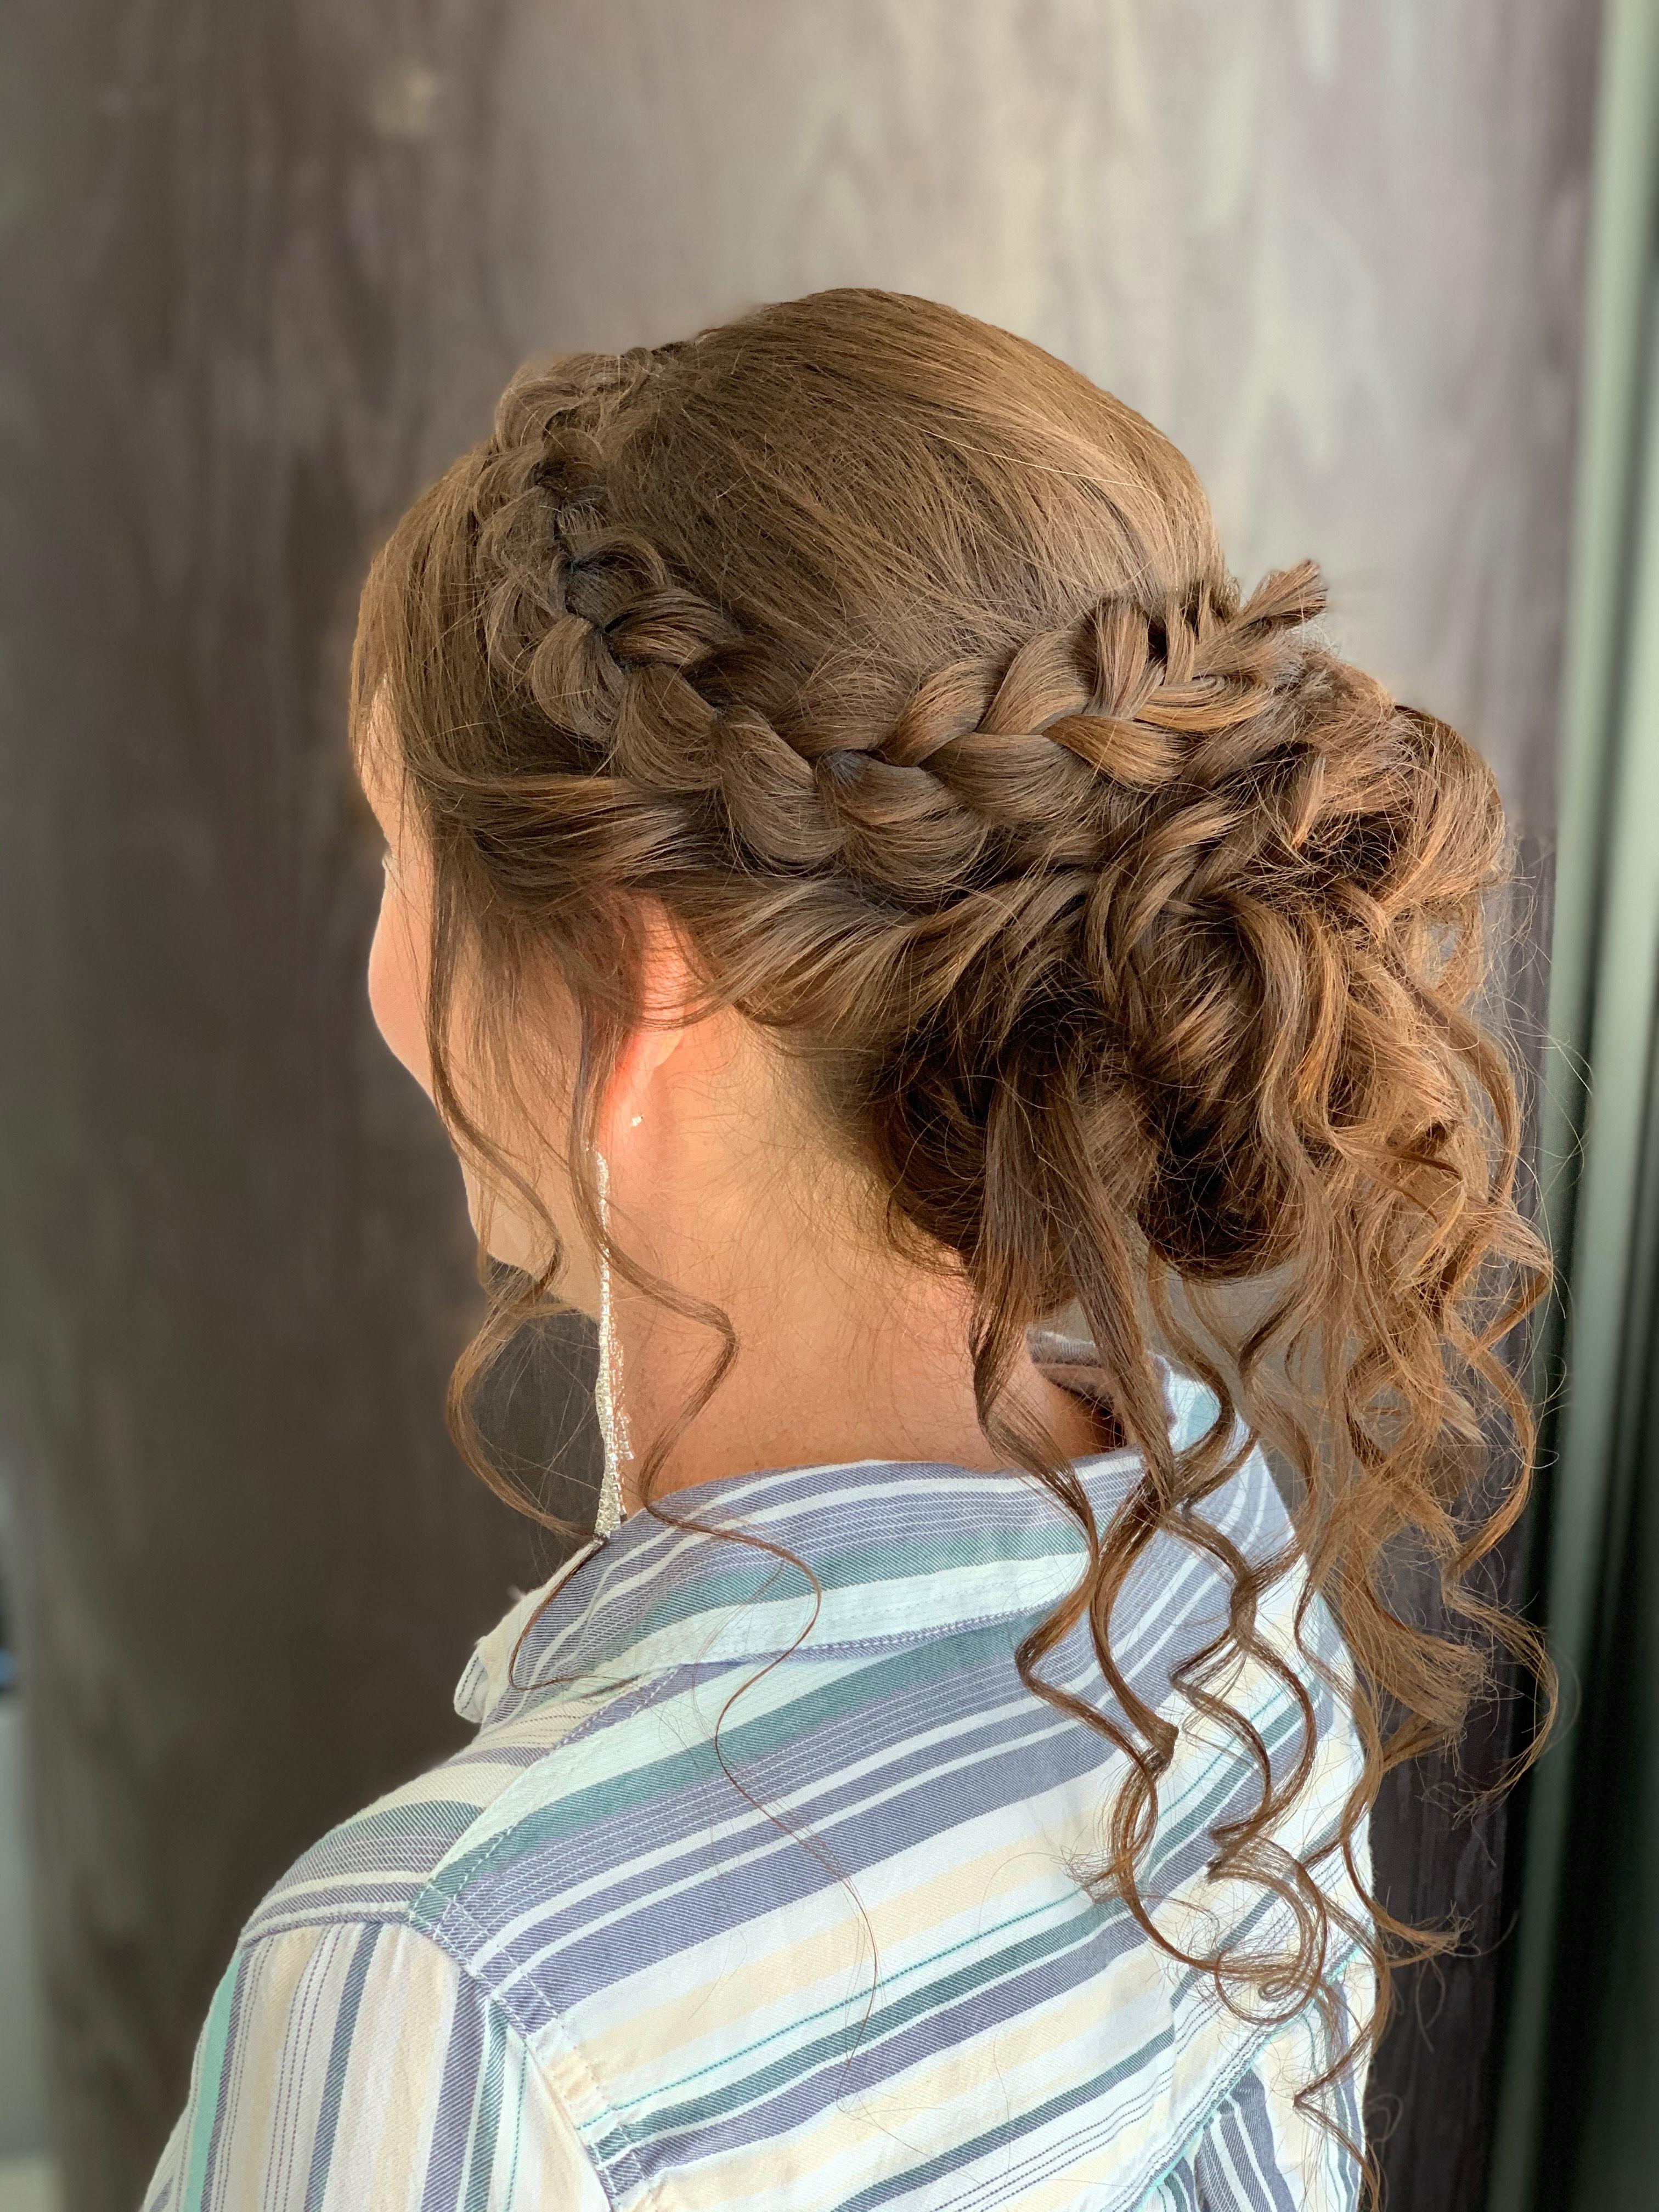 Hairstyles for you in 2020 vegas hair las vegas